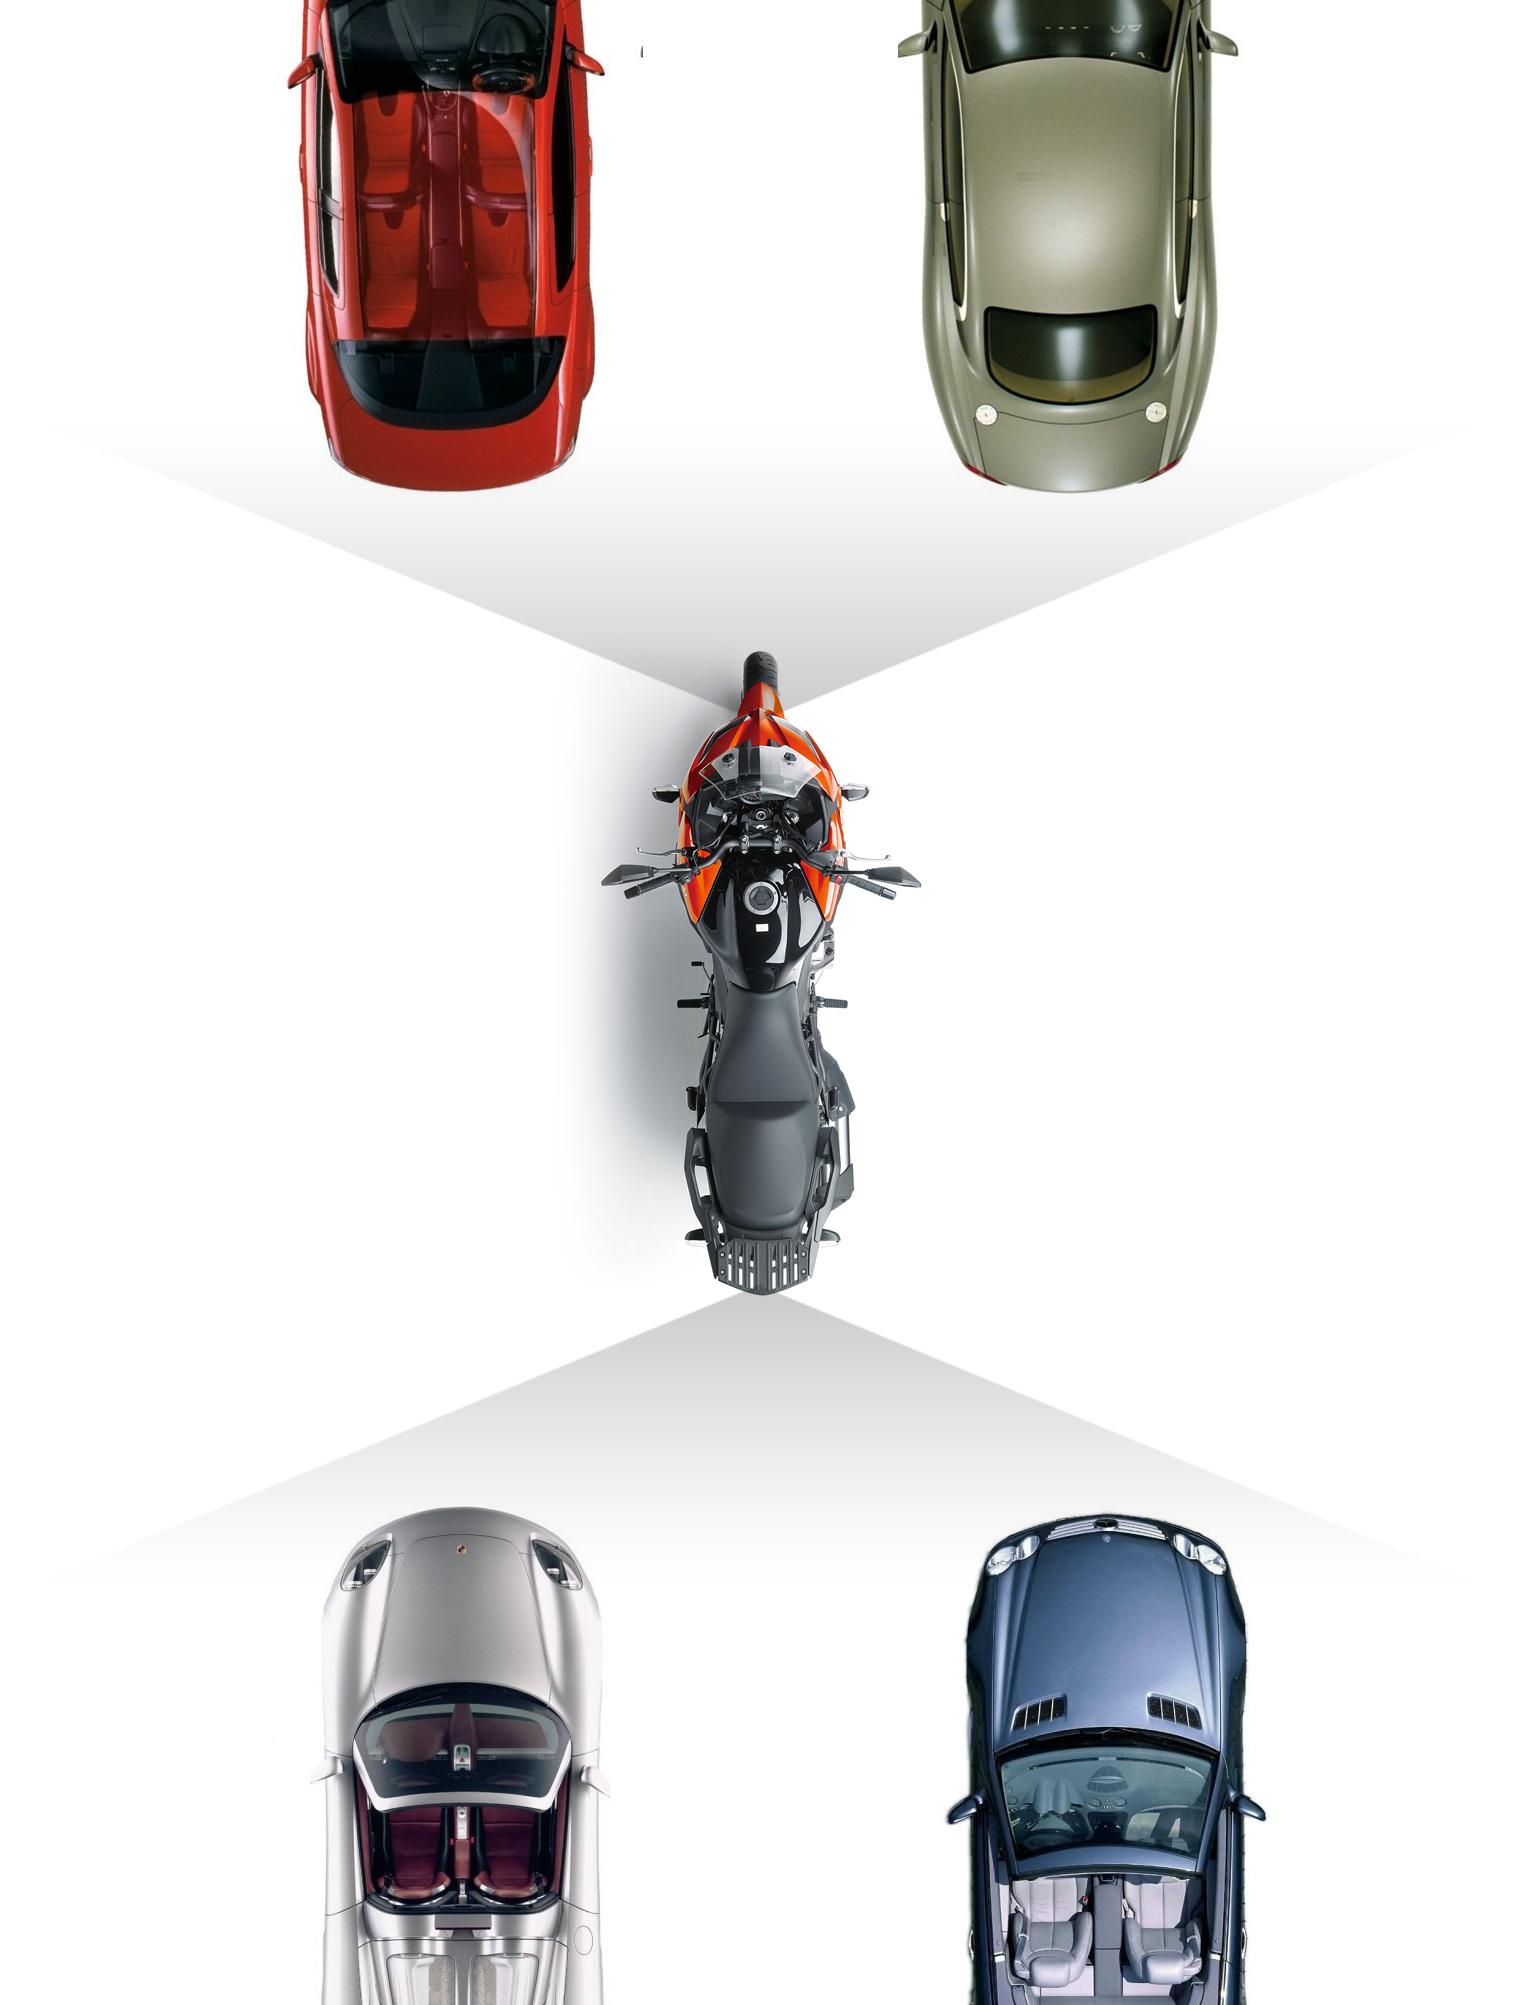 Innovv motorcycle cam parking.jpg